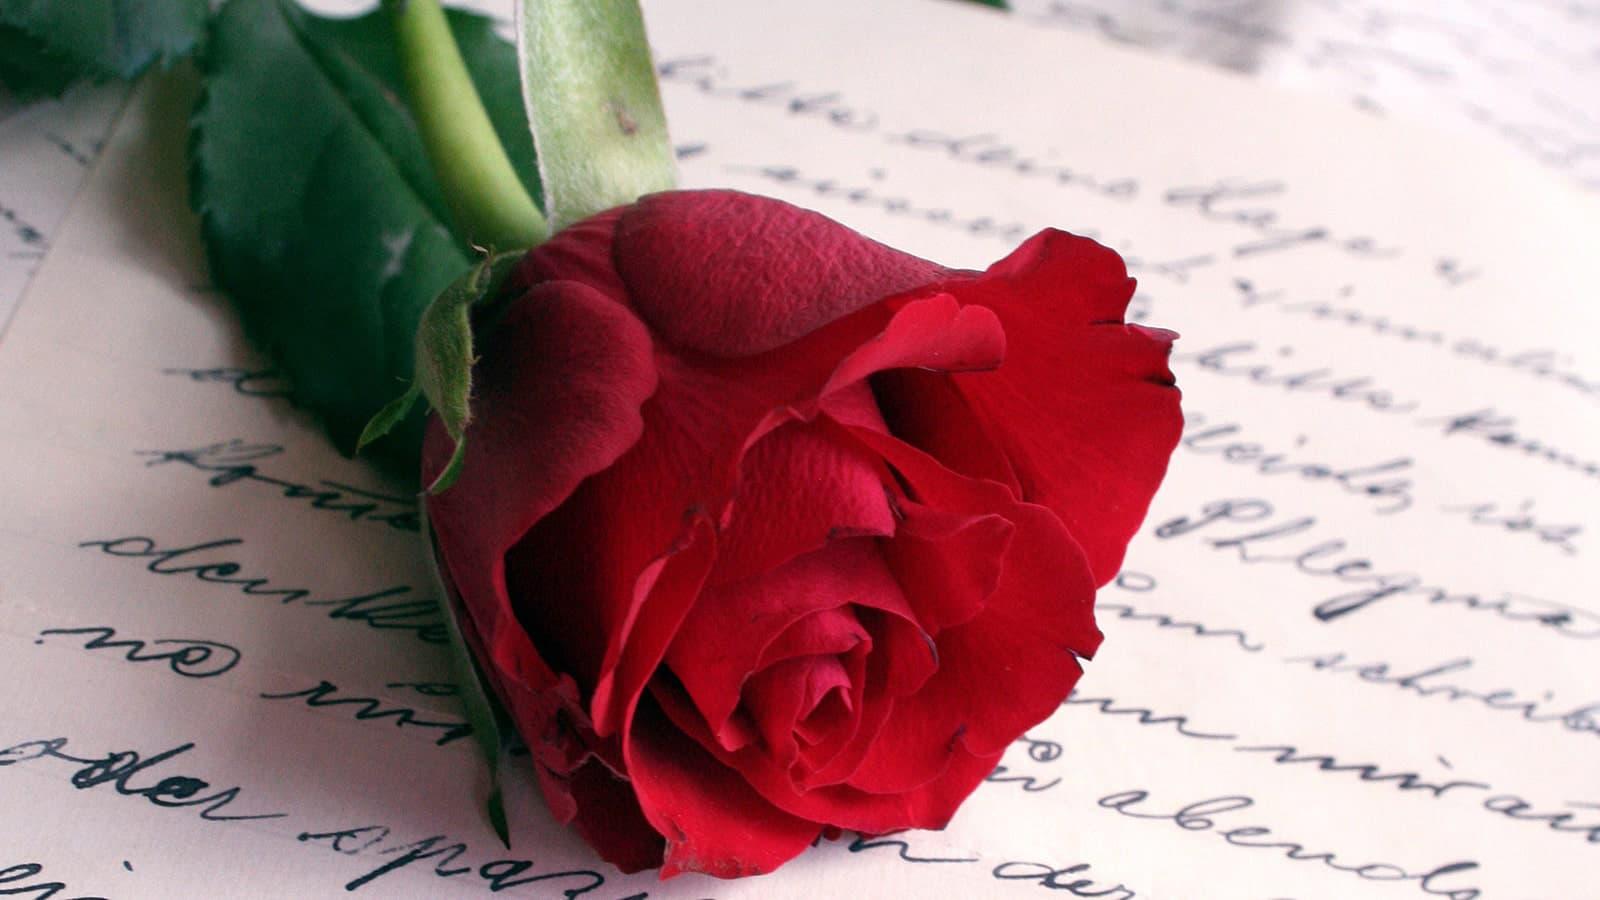 Rose laid on a love poem